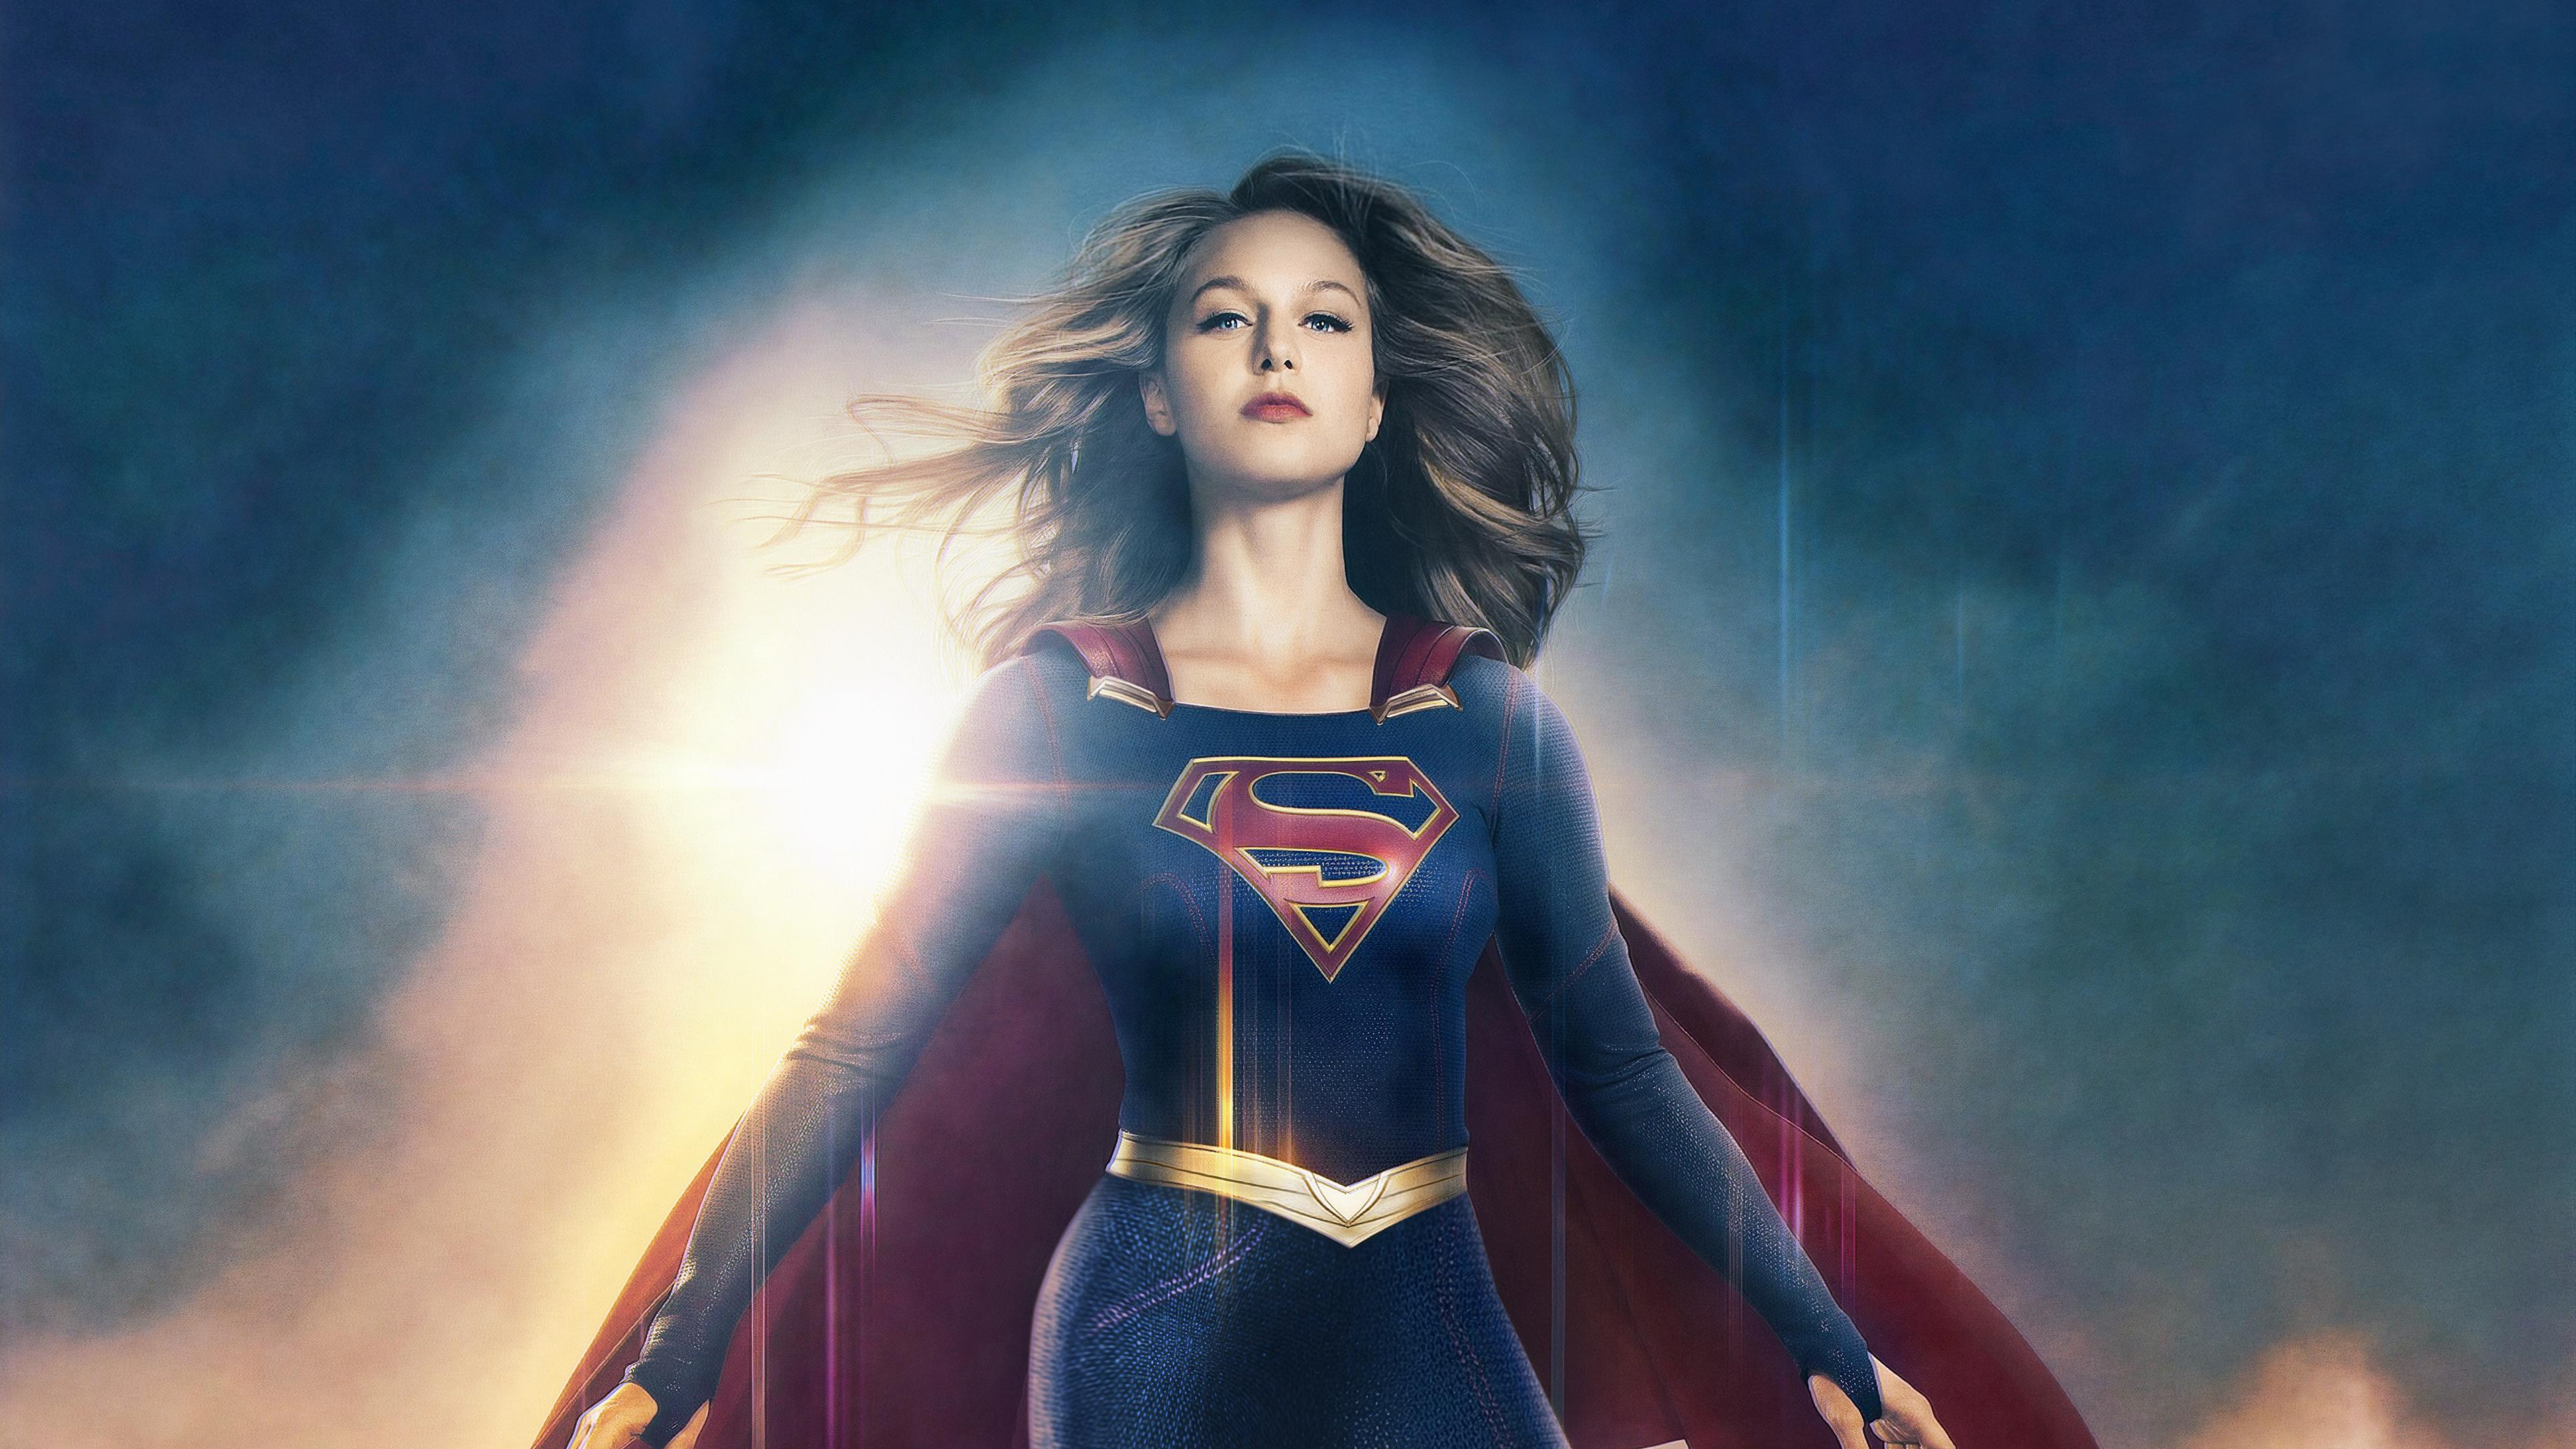 supergirl art 1565053347 - Supergirl Art - superheroes wallpapers, supergirl wallpapers, hd-wallpapers, digital art wallpapers, deviantart wallpapers, artwork wallpapers, artist wallpapers, 4k-wallpapers